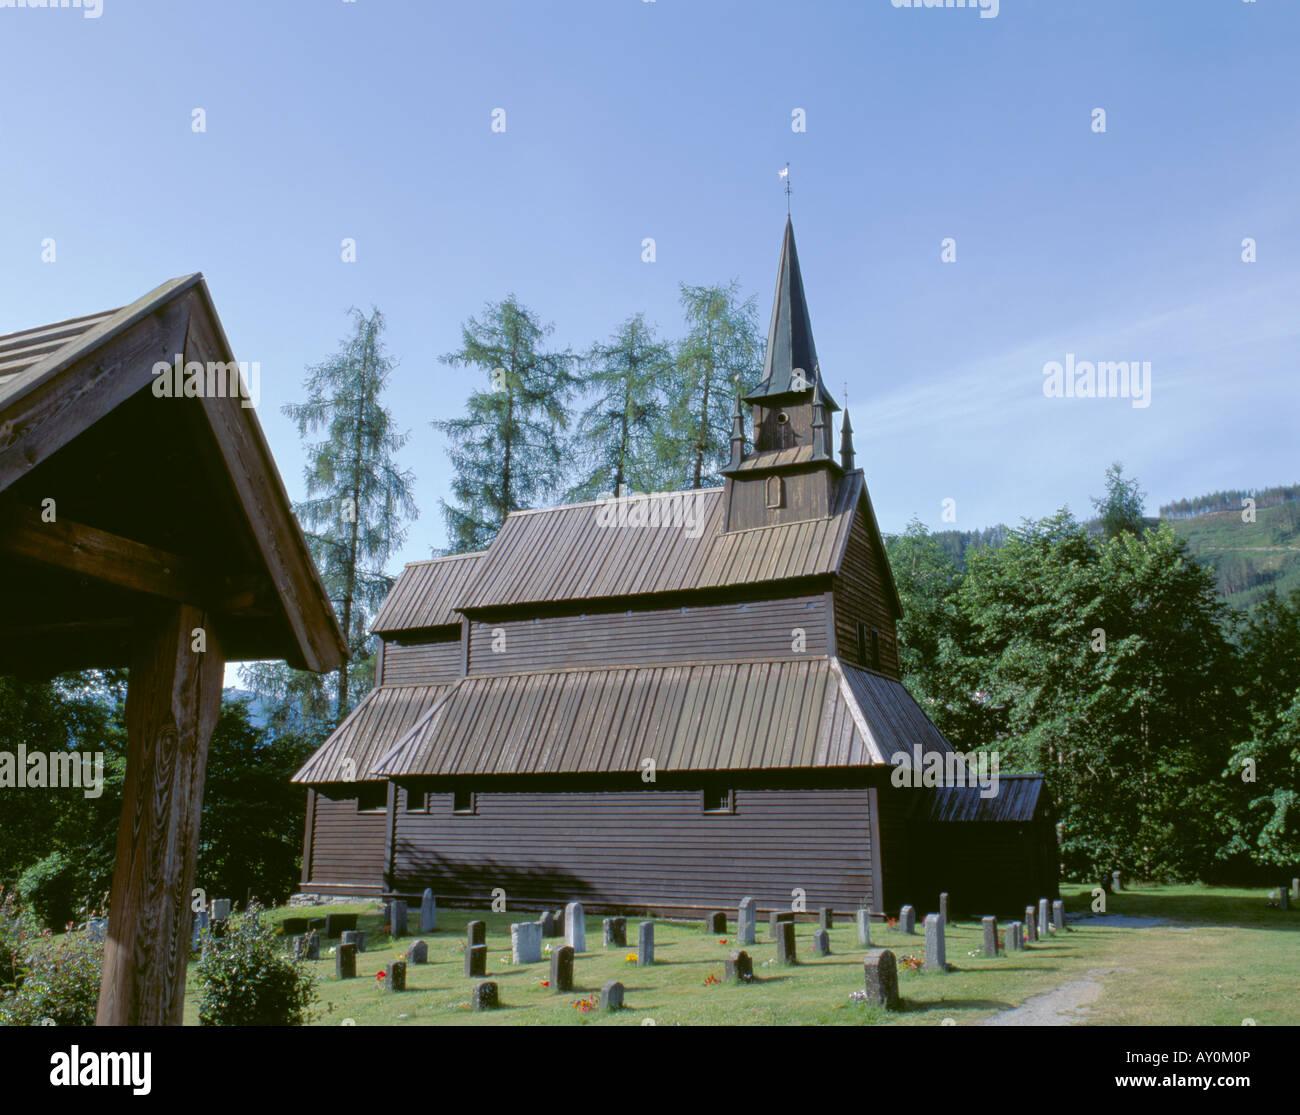 chinese dating site sogn og fjordane